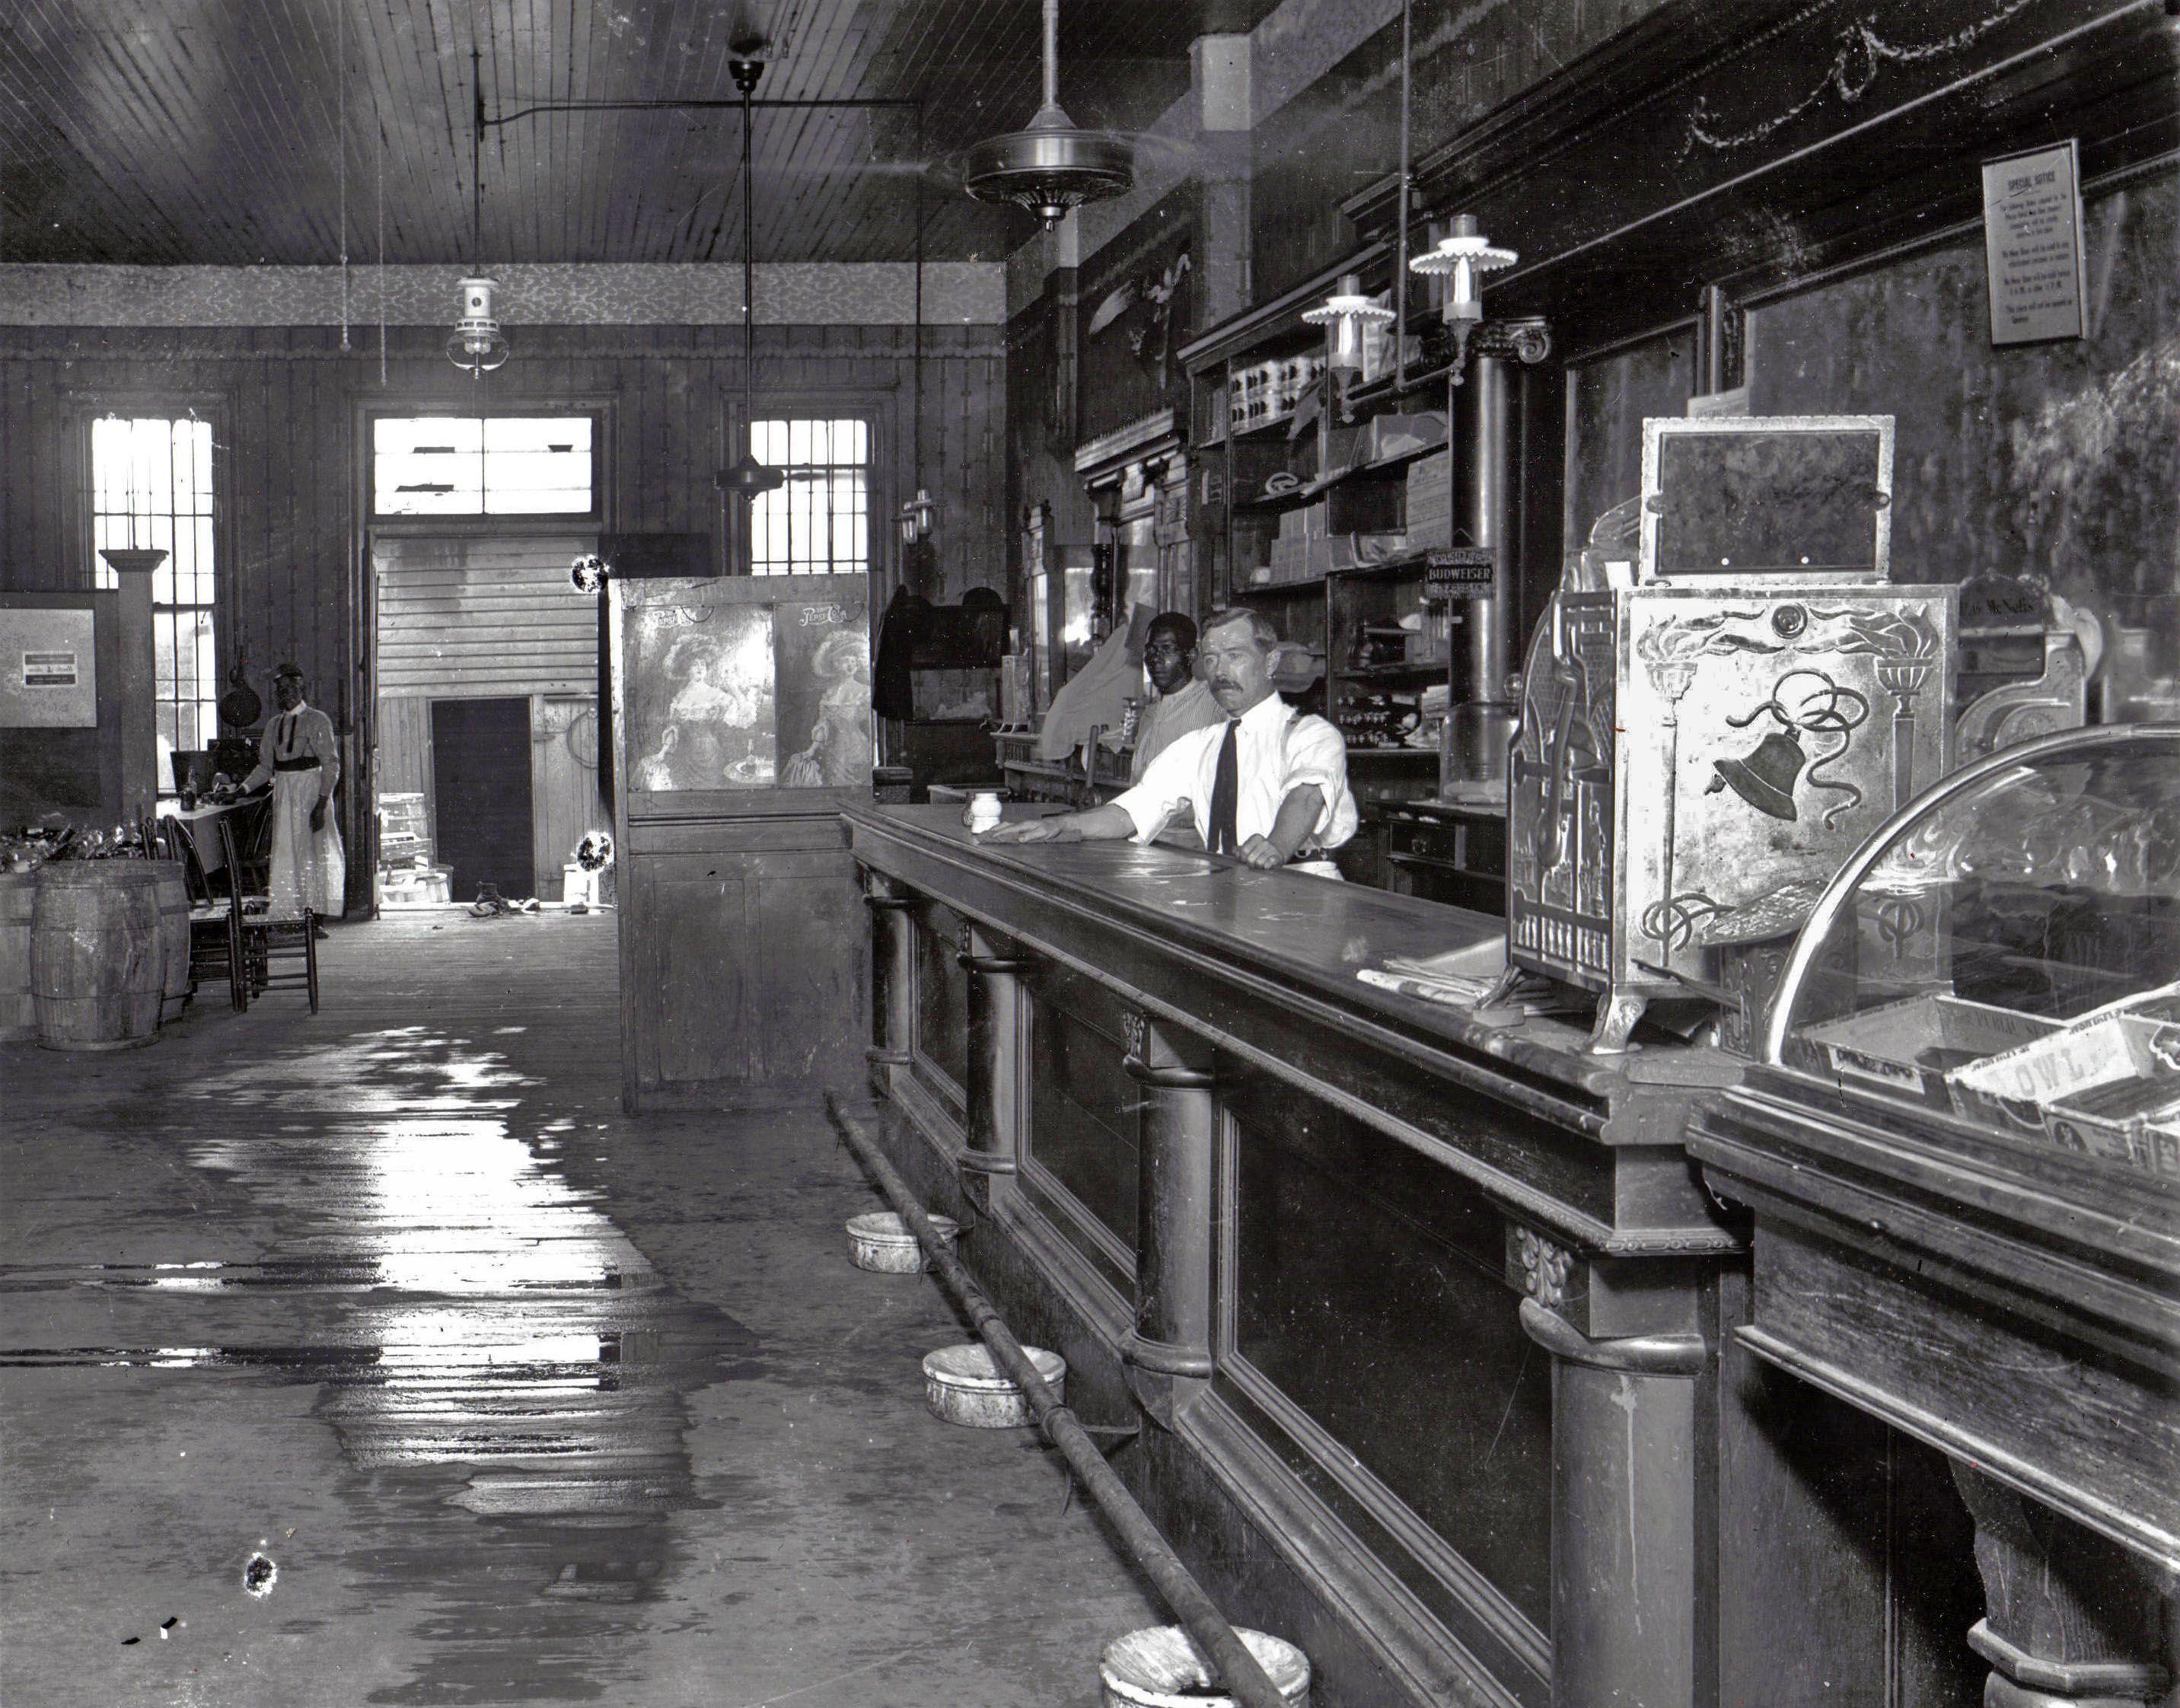 1904 Tap Room San Francisco 1890 1920 Progressive